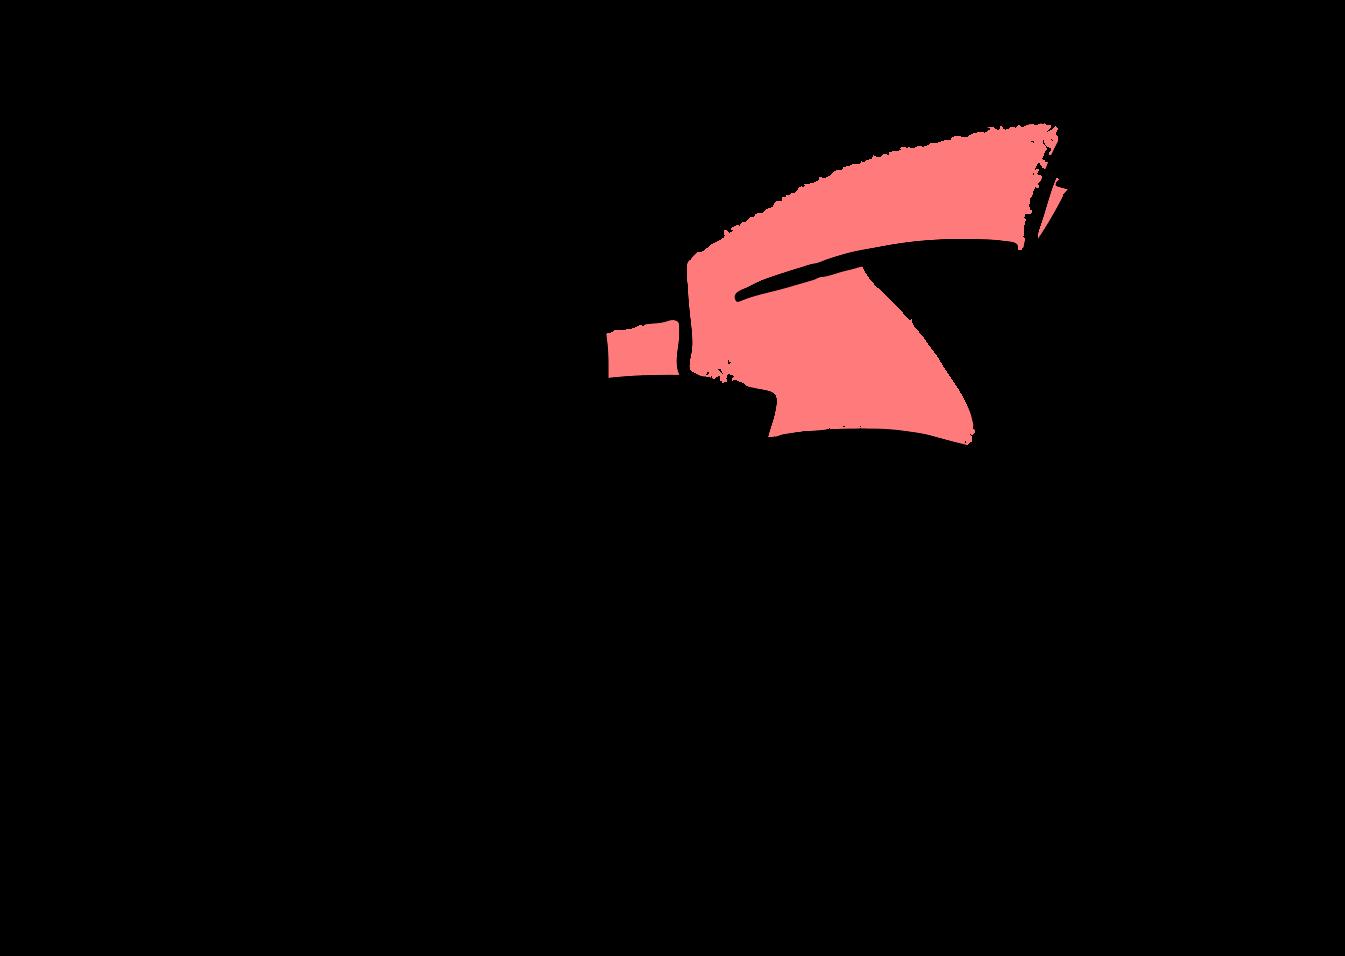 illustration of woman jumping